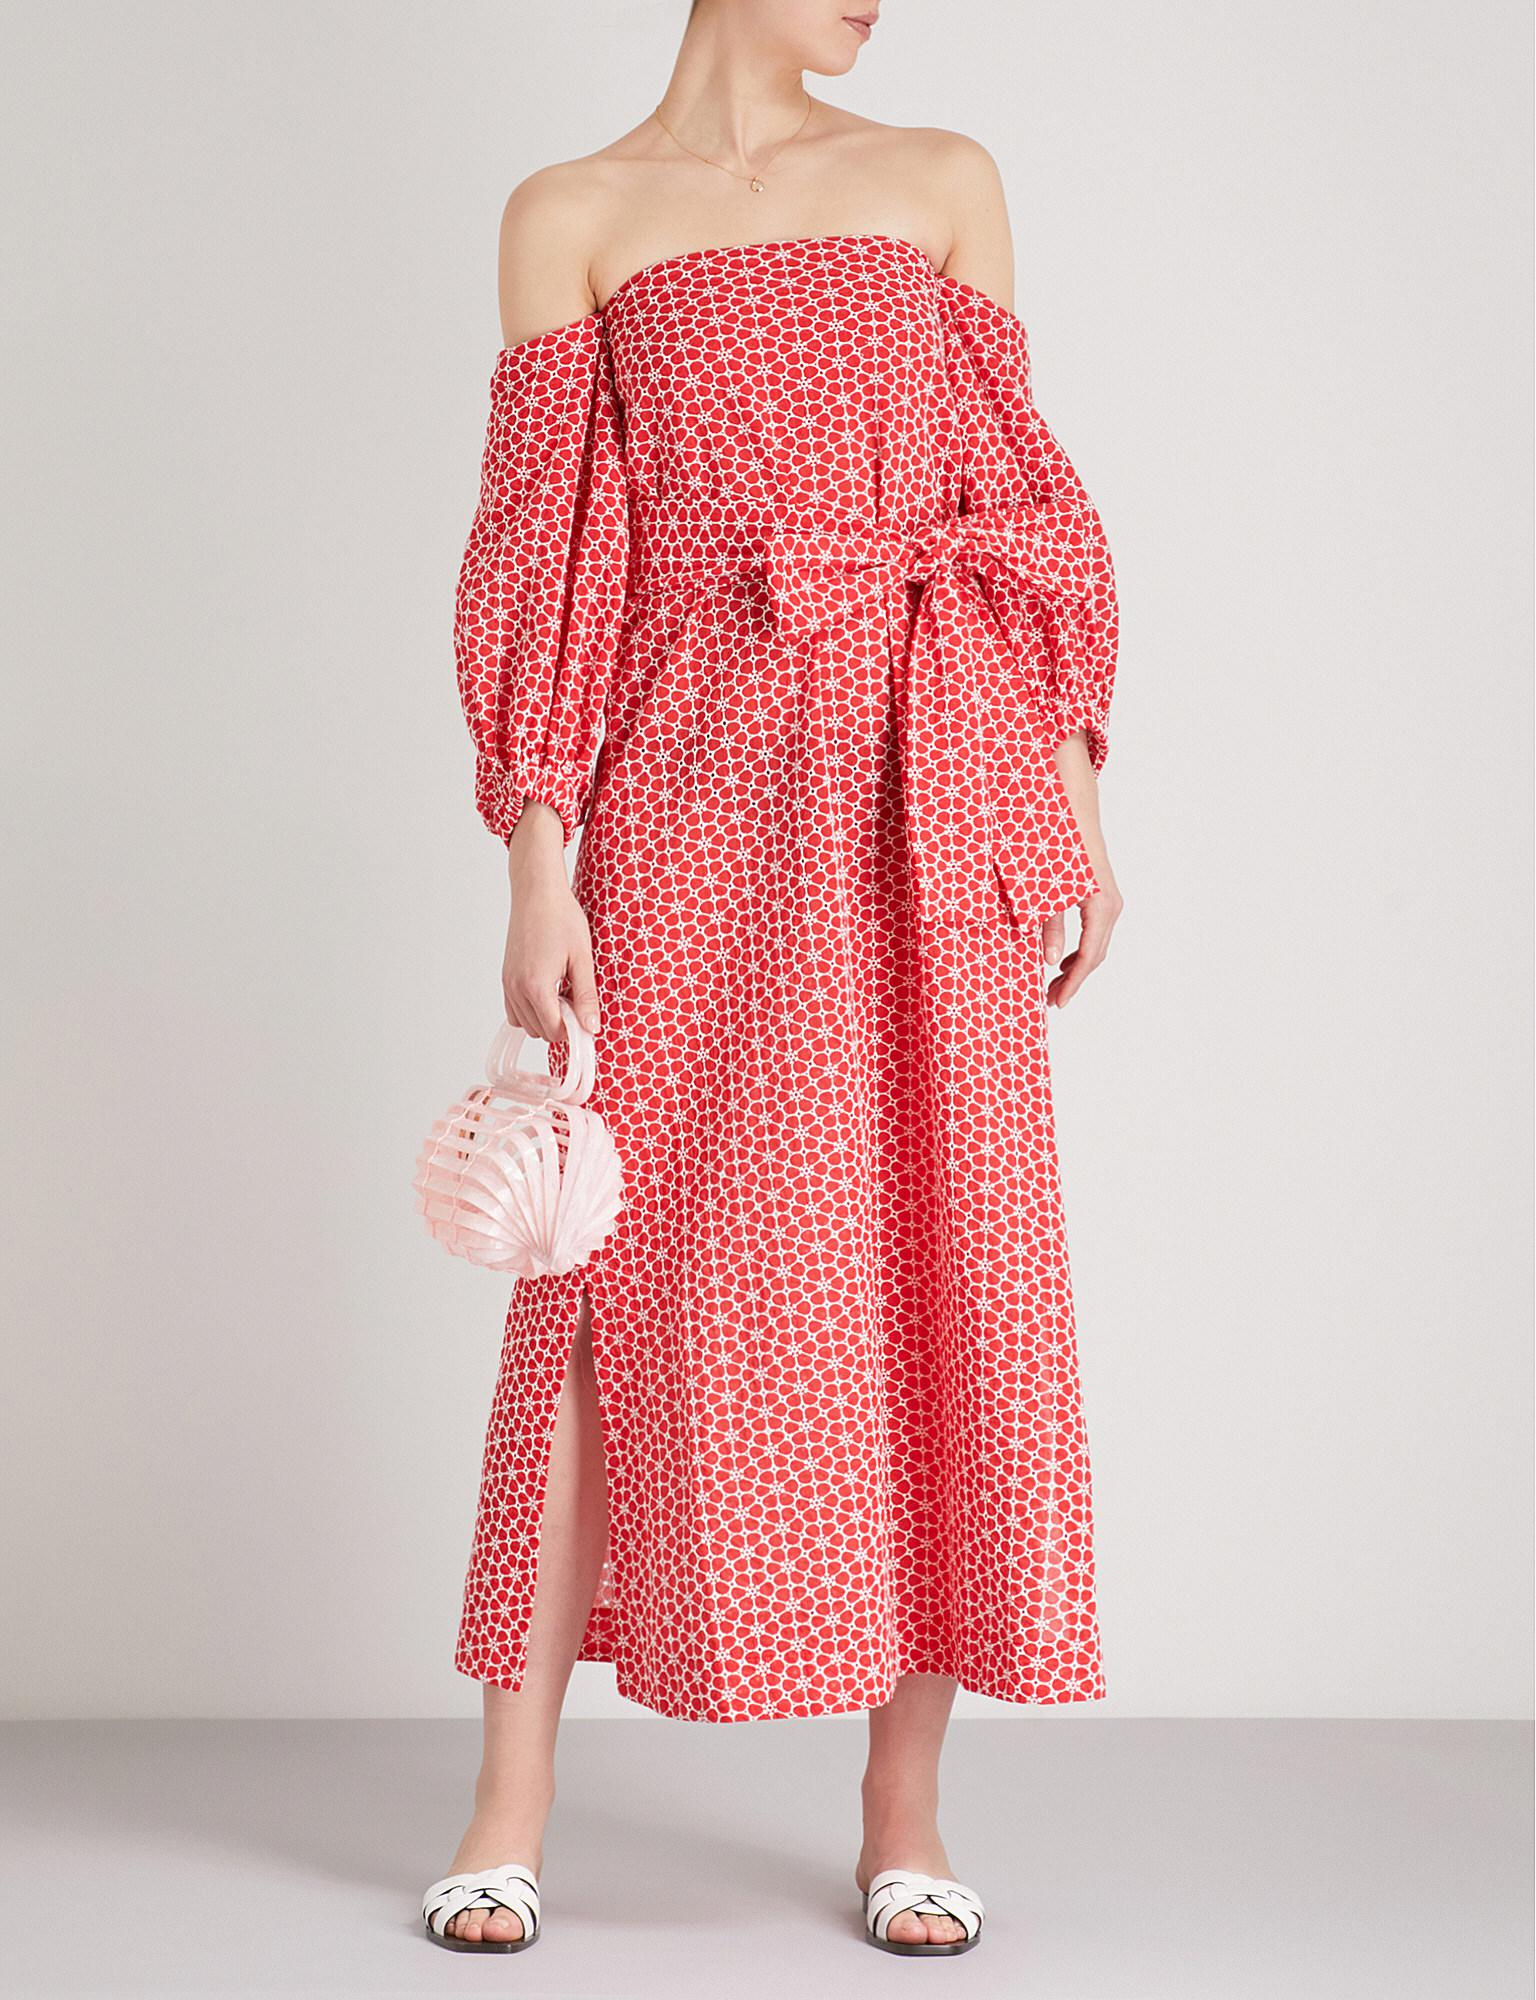 Womens Rosie Embroidered Linen Dress Lisa Marie Fernandez IZe9Z